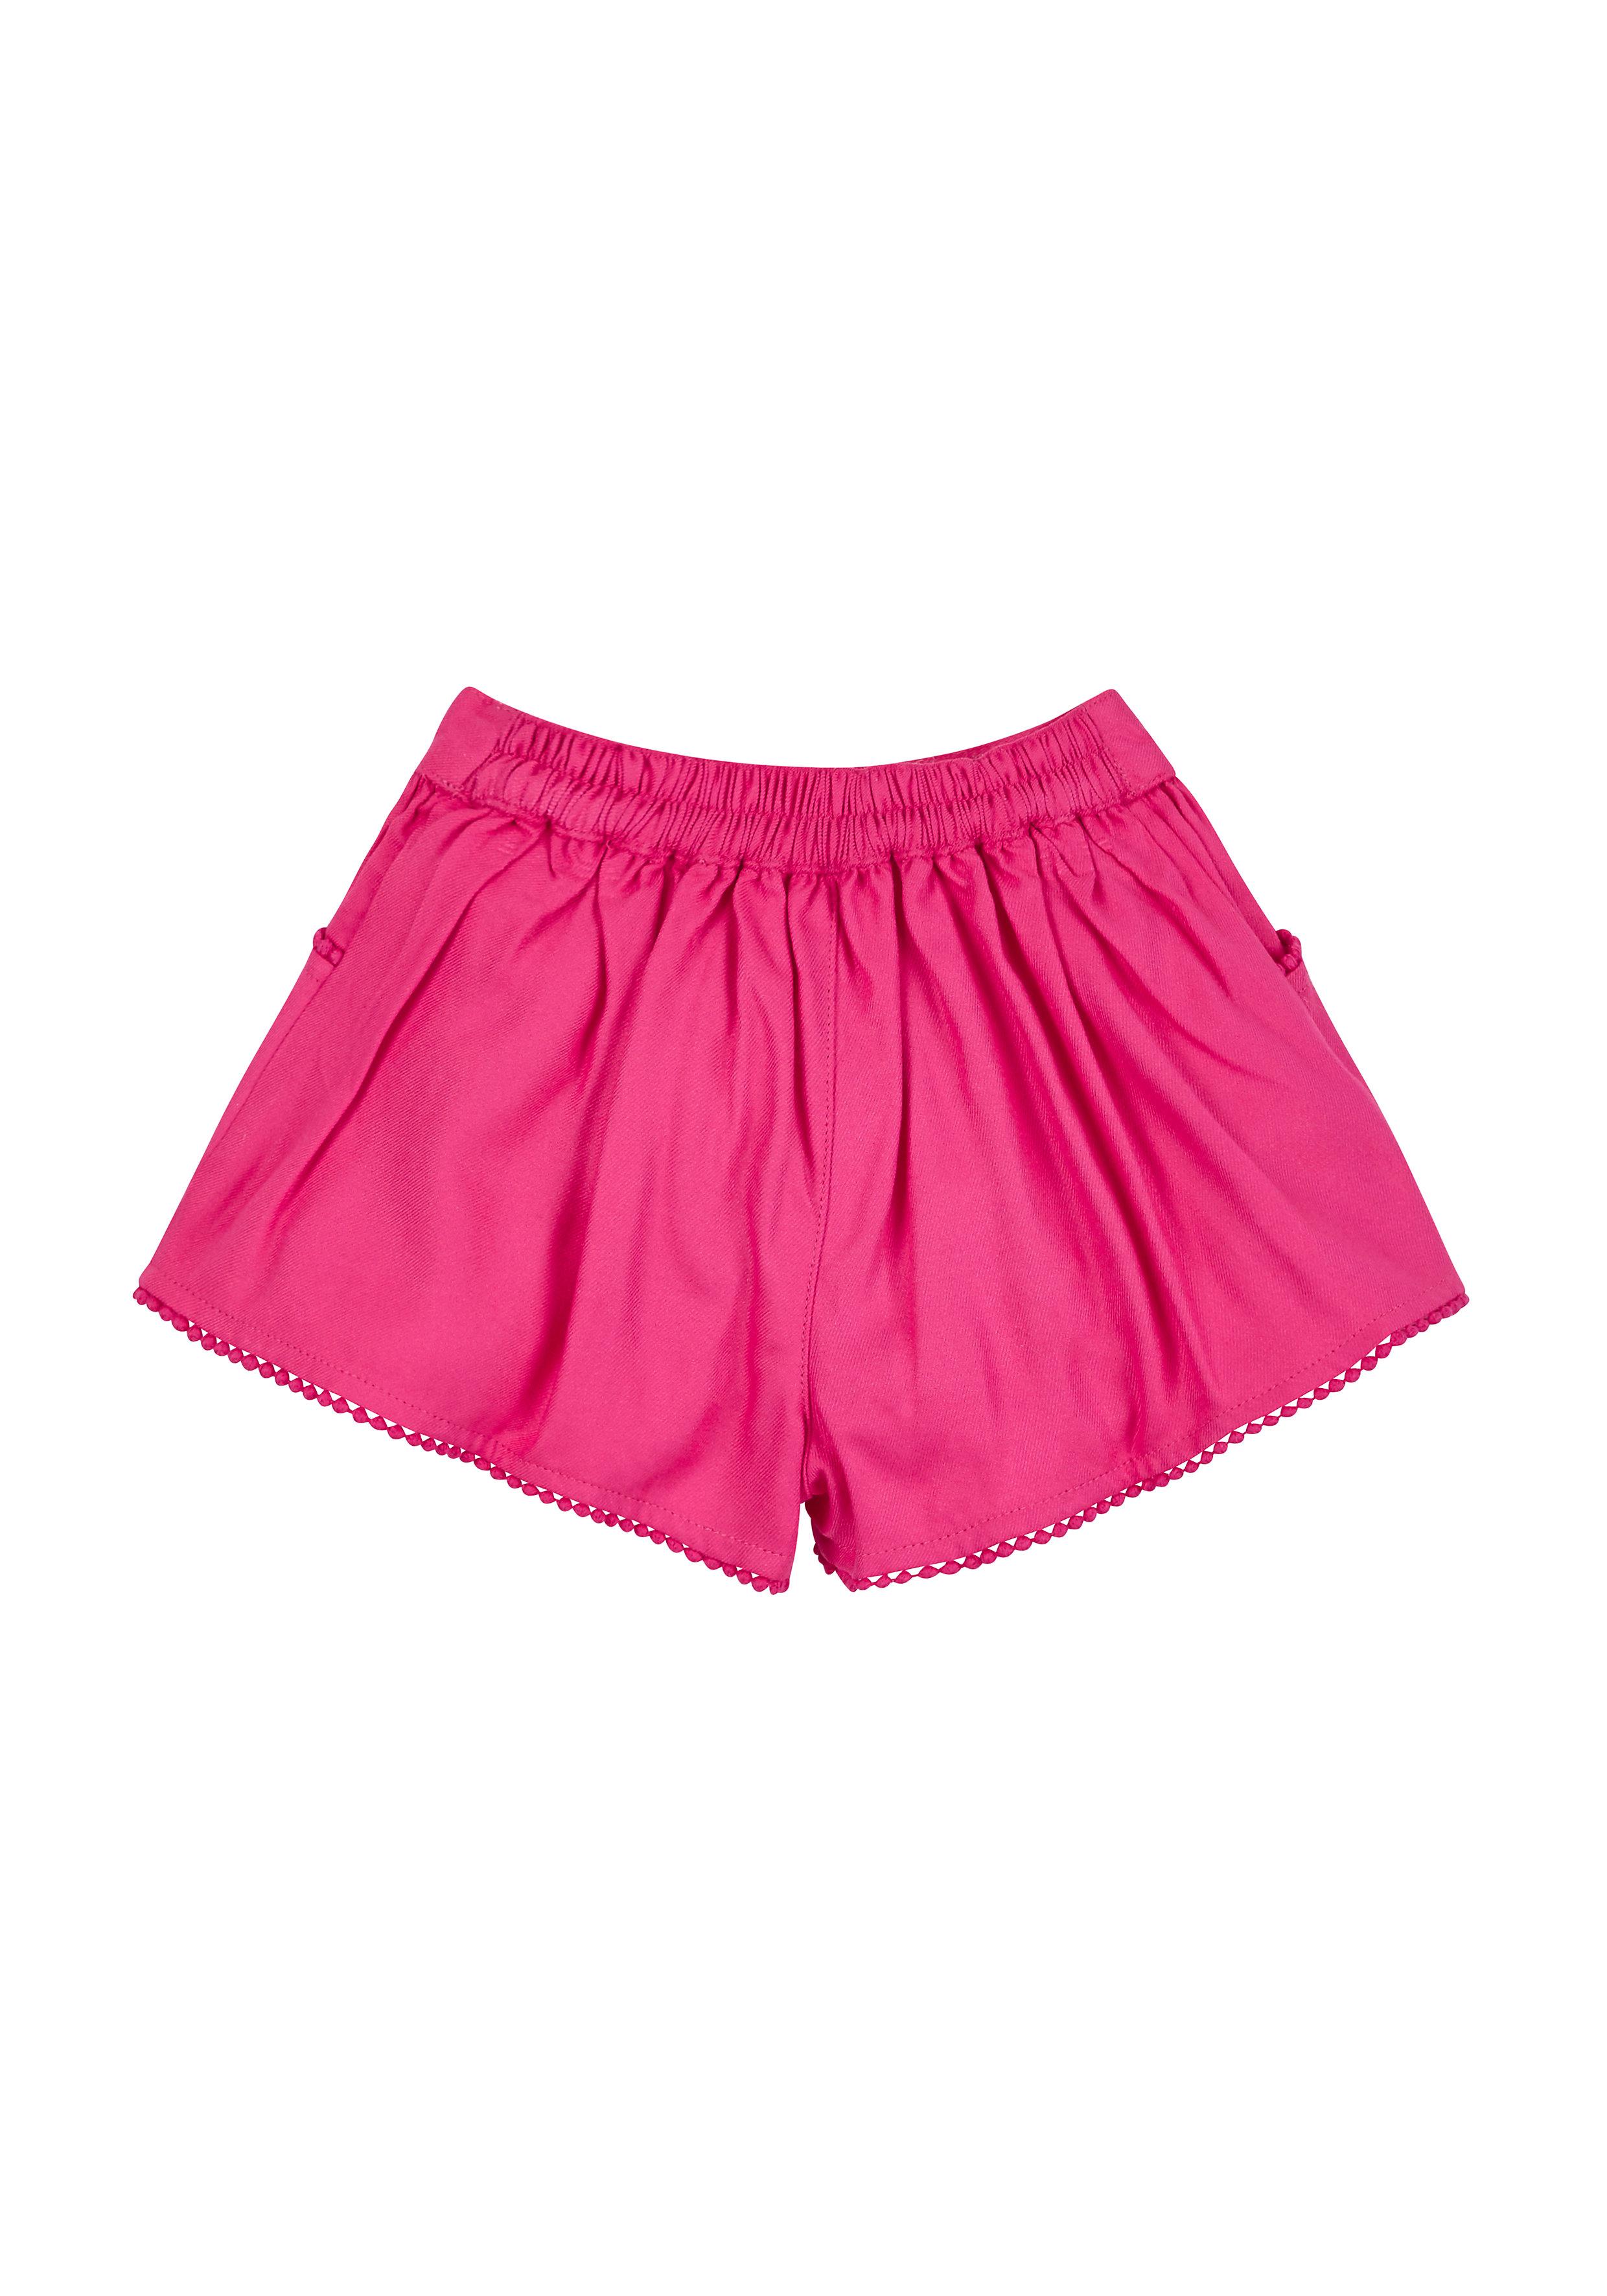 Mothercare | Girls Shorts - Pink